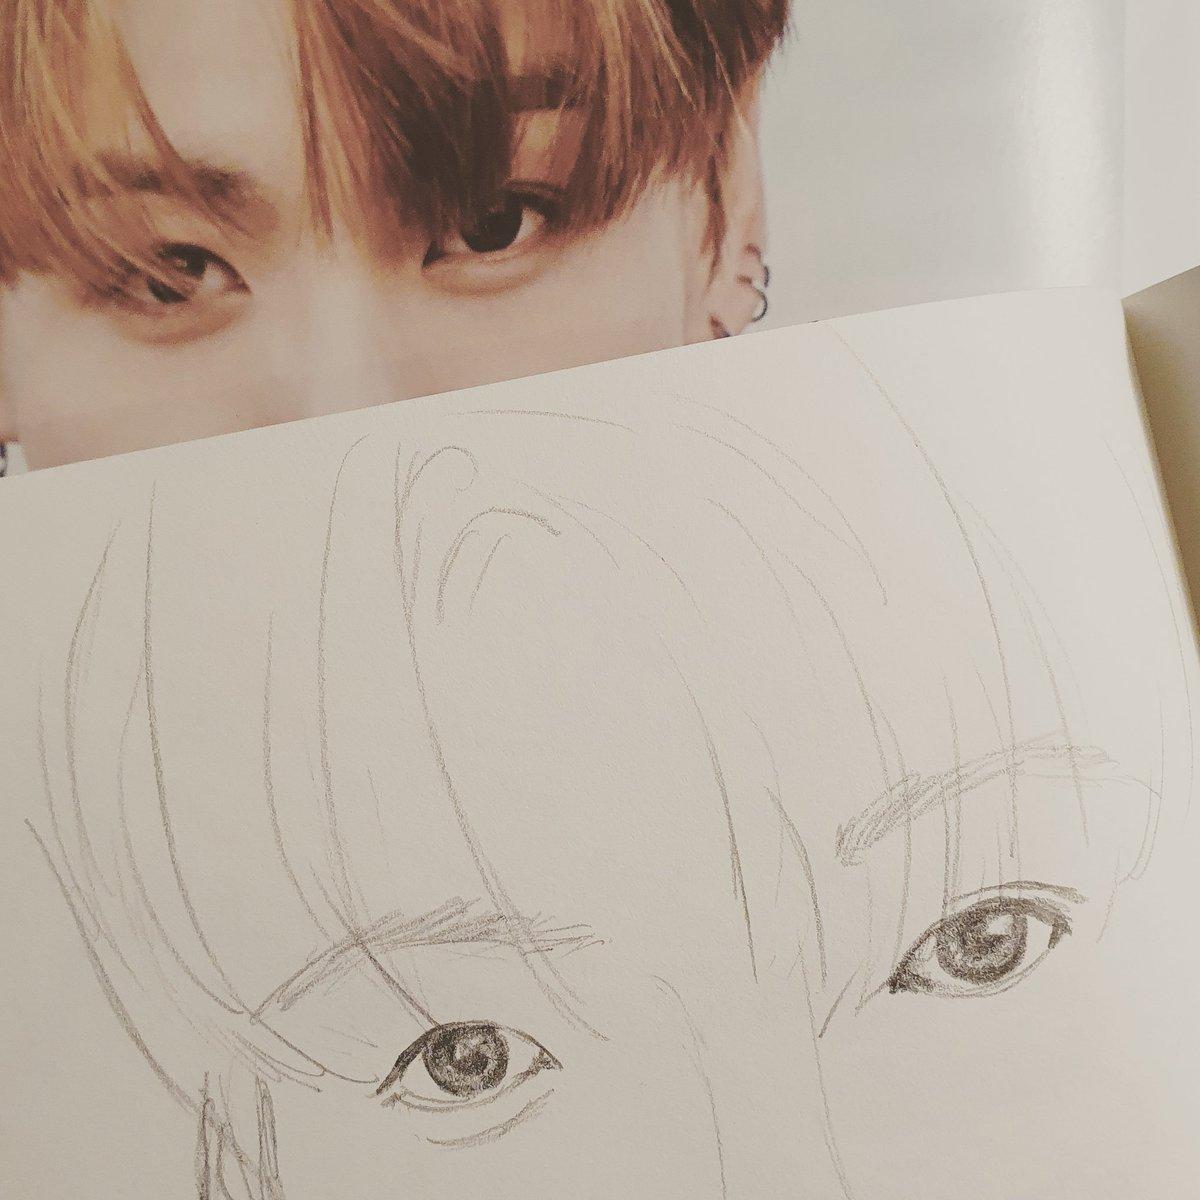 I didn't do any justice to jungkook's bambi eyes 😅  #jungkook #jeonjungkook #btsjungkook #bts #bangtansonyeondan #btsfanart #sketch #sketchbook #drawing #art #bangtan #onebangtanaday #baguettesarmysxart #youneverwalkalone #ynwa